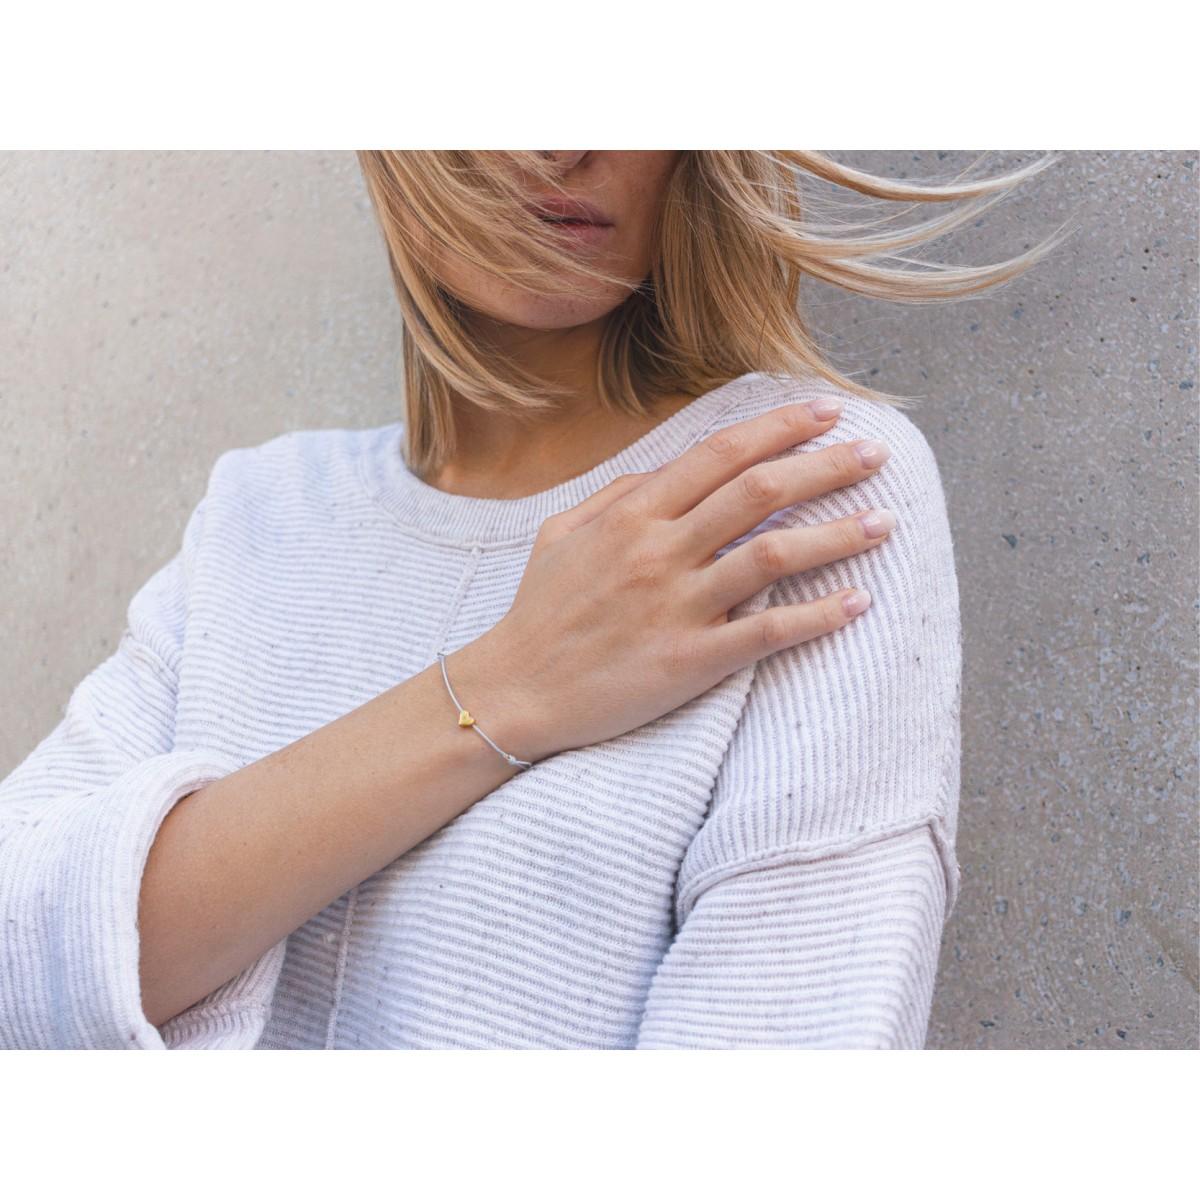 typealive / Armband / Heart You